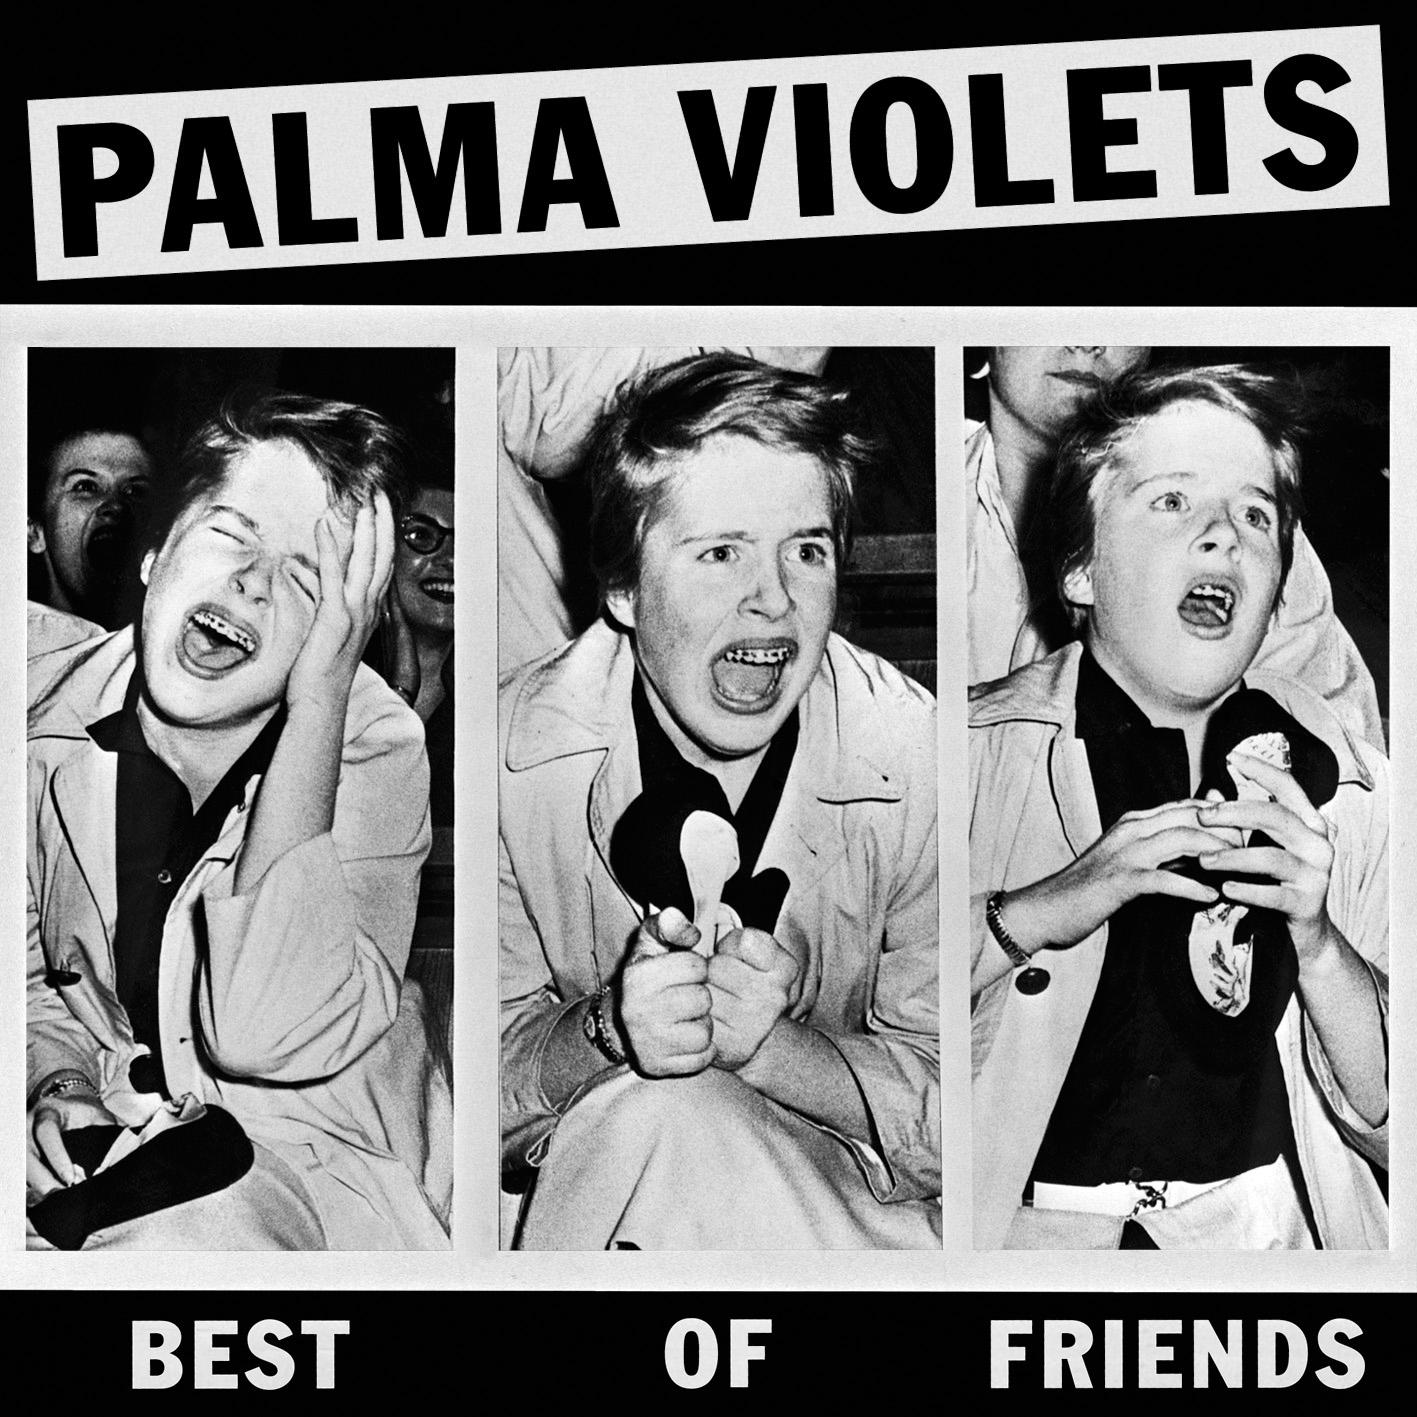 palma violets best of friends